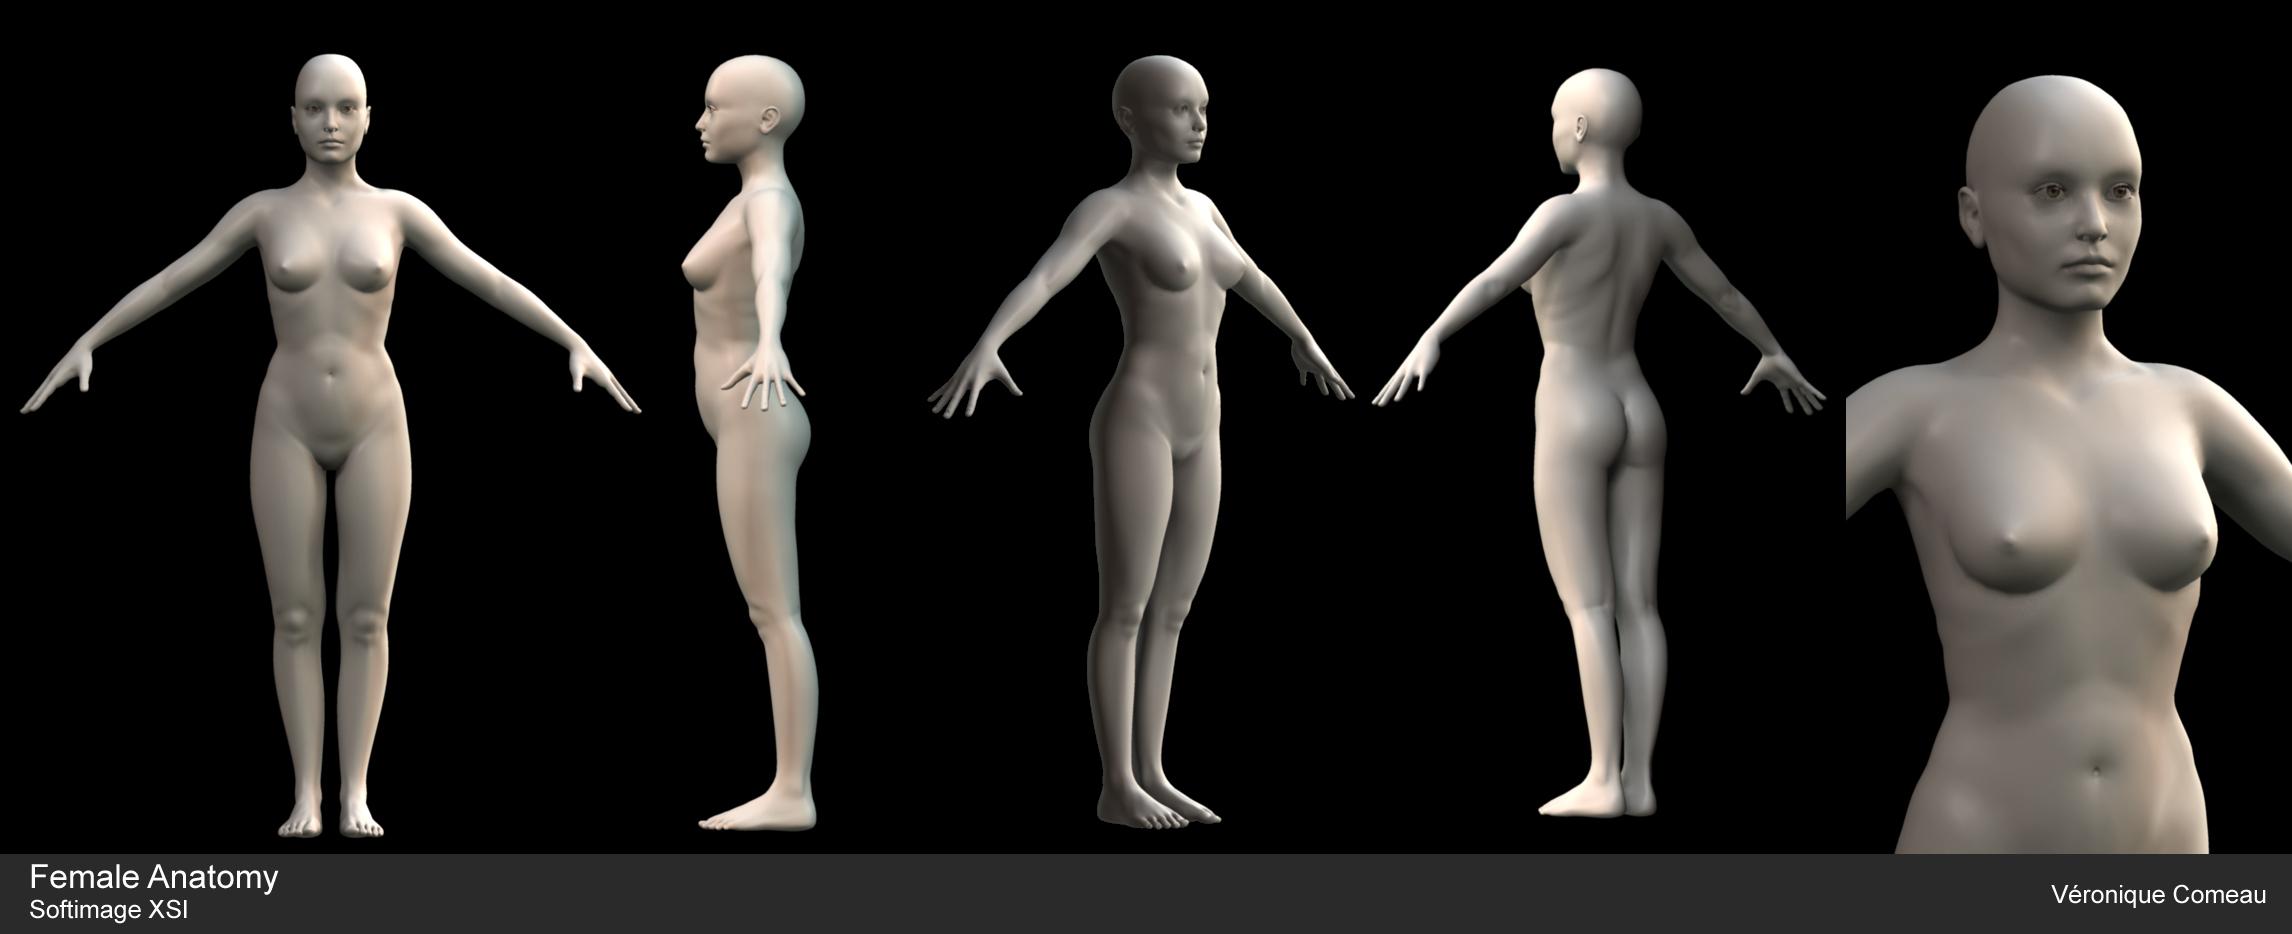 Female Anatomy By Verokomo On Deviantart